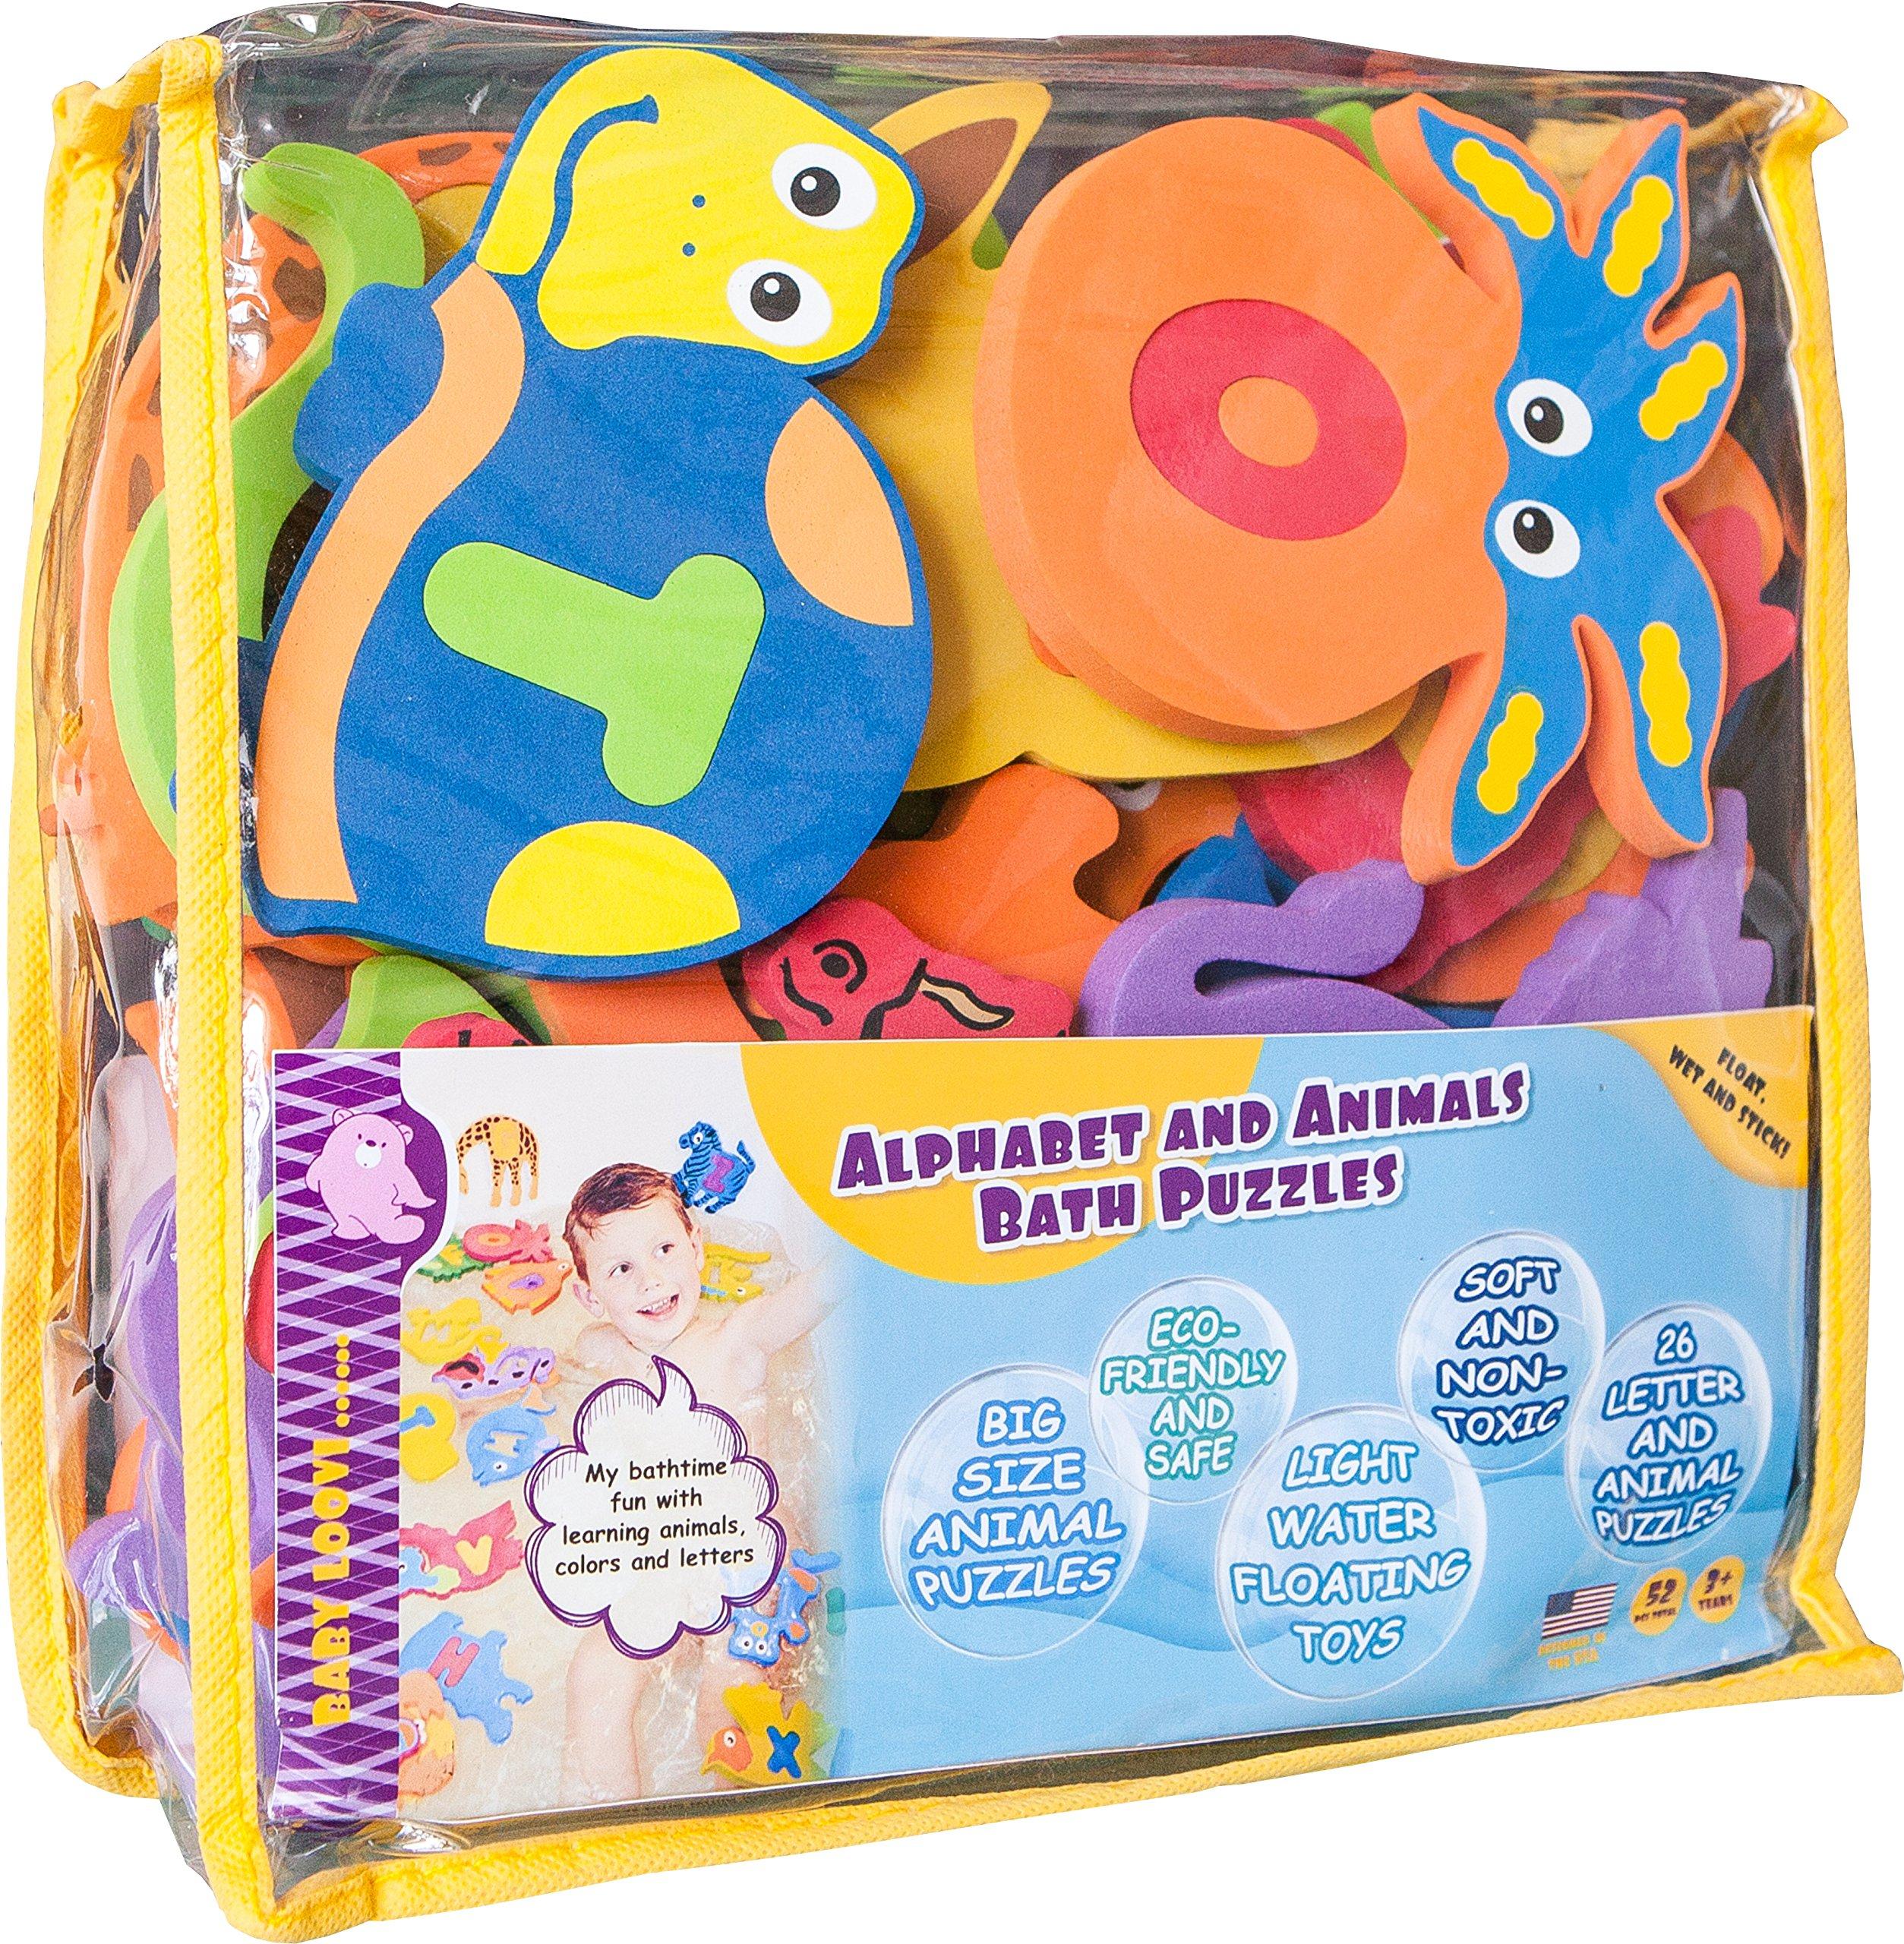 Foam Bath Toys 100% Non-Toxic Preschool Alphabet - Best Baby Bath Toys Toddlers Kids Girls Boys - Premium Educational Floating Bathtub Toys - Biggest Set Letters Animals (26 Puzzles - 52 Items) by BABY LOOVI